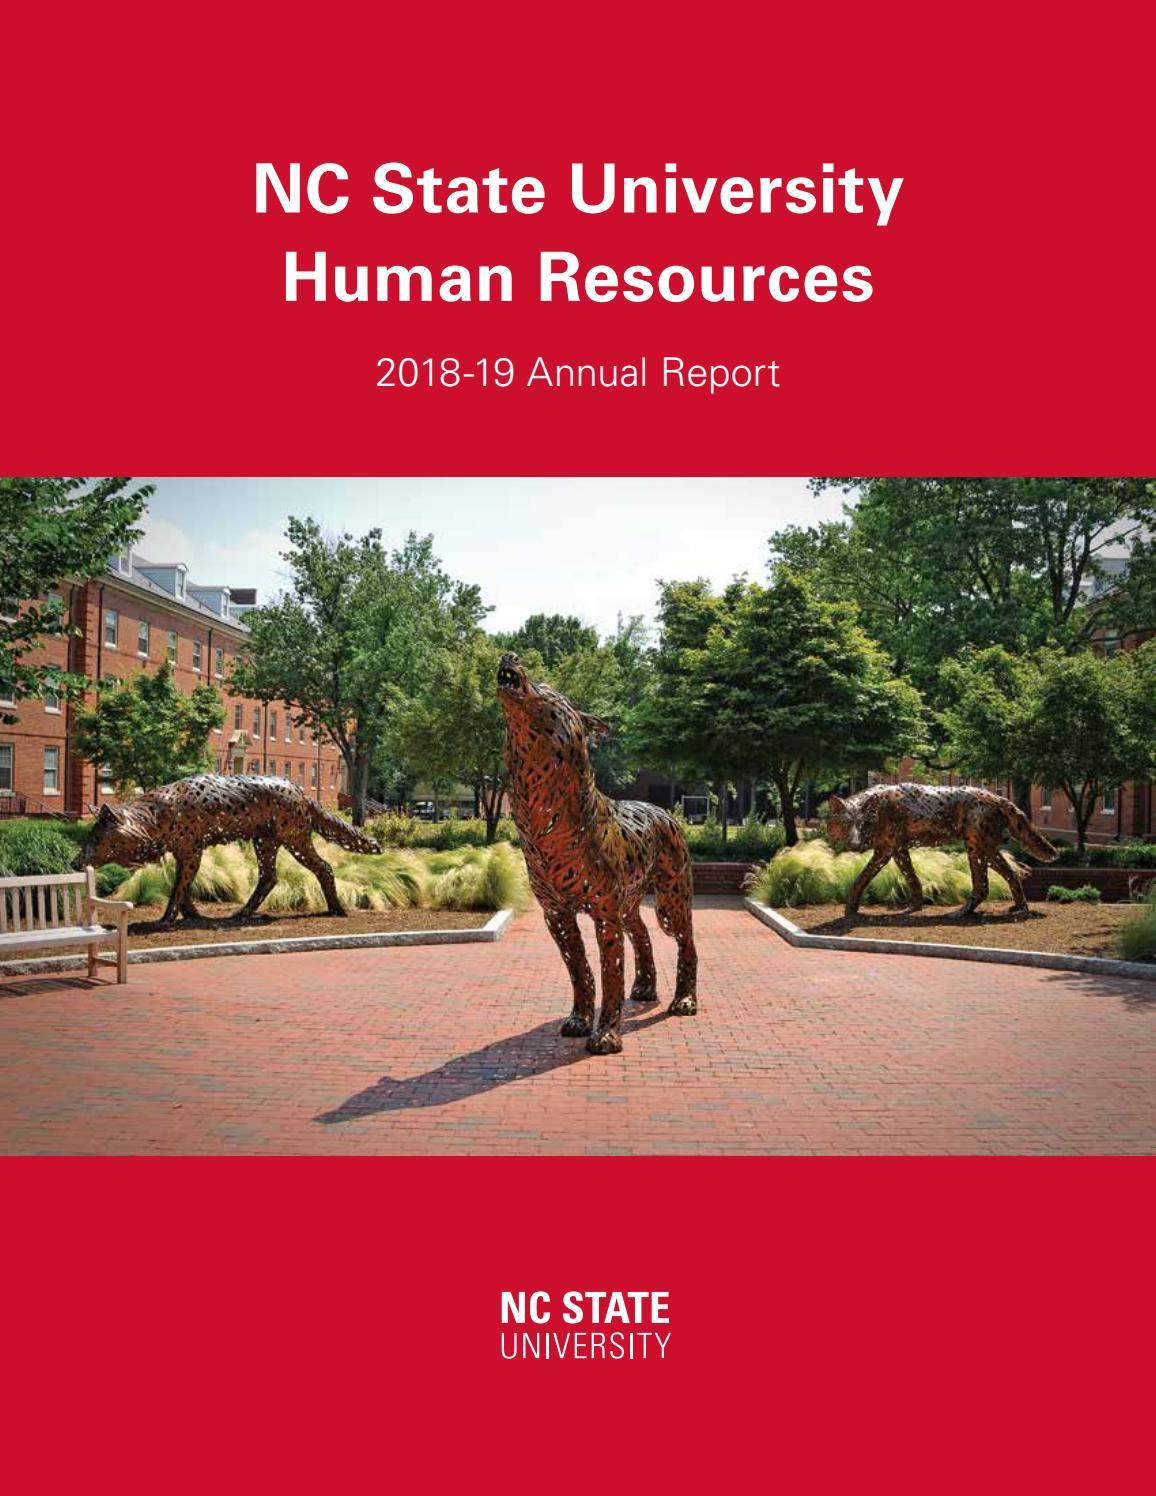 Ncsu 2022 Calendar.Nc State University Human Resources Annual Report 2018 19 By Ncsu Hr Issuu